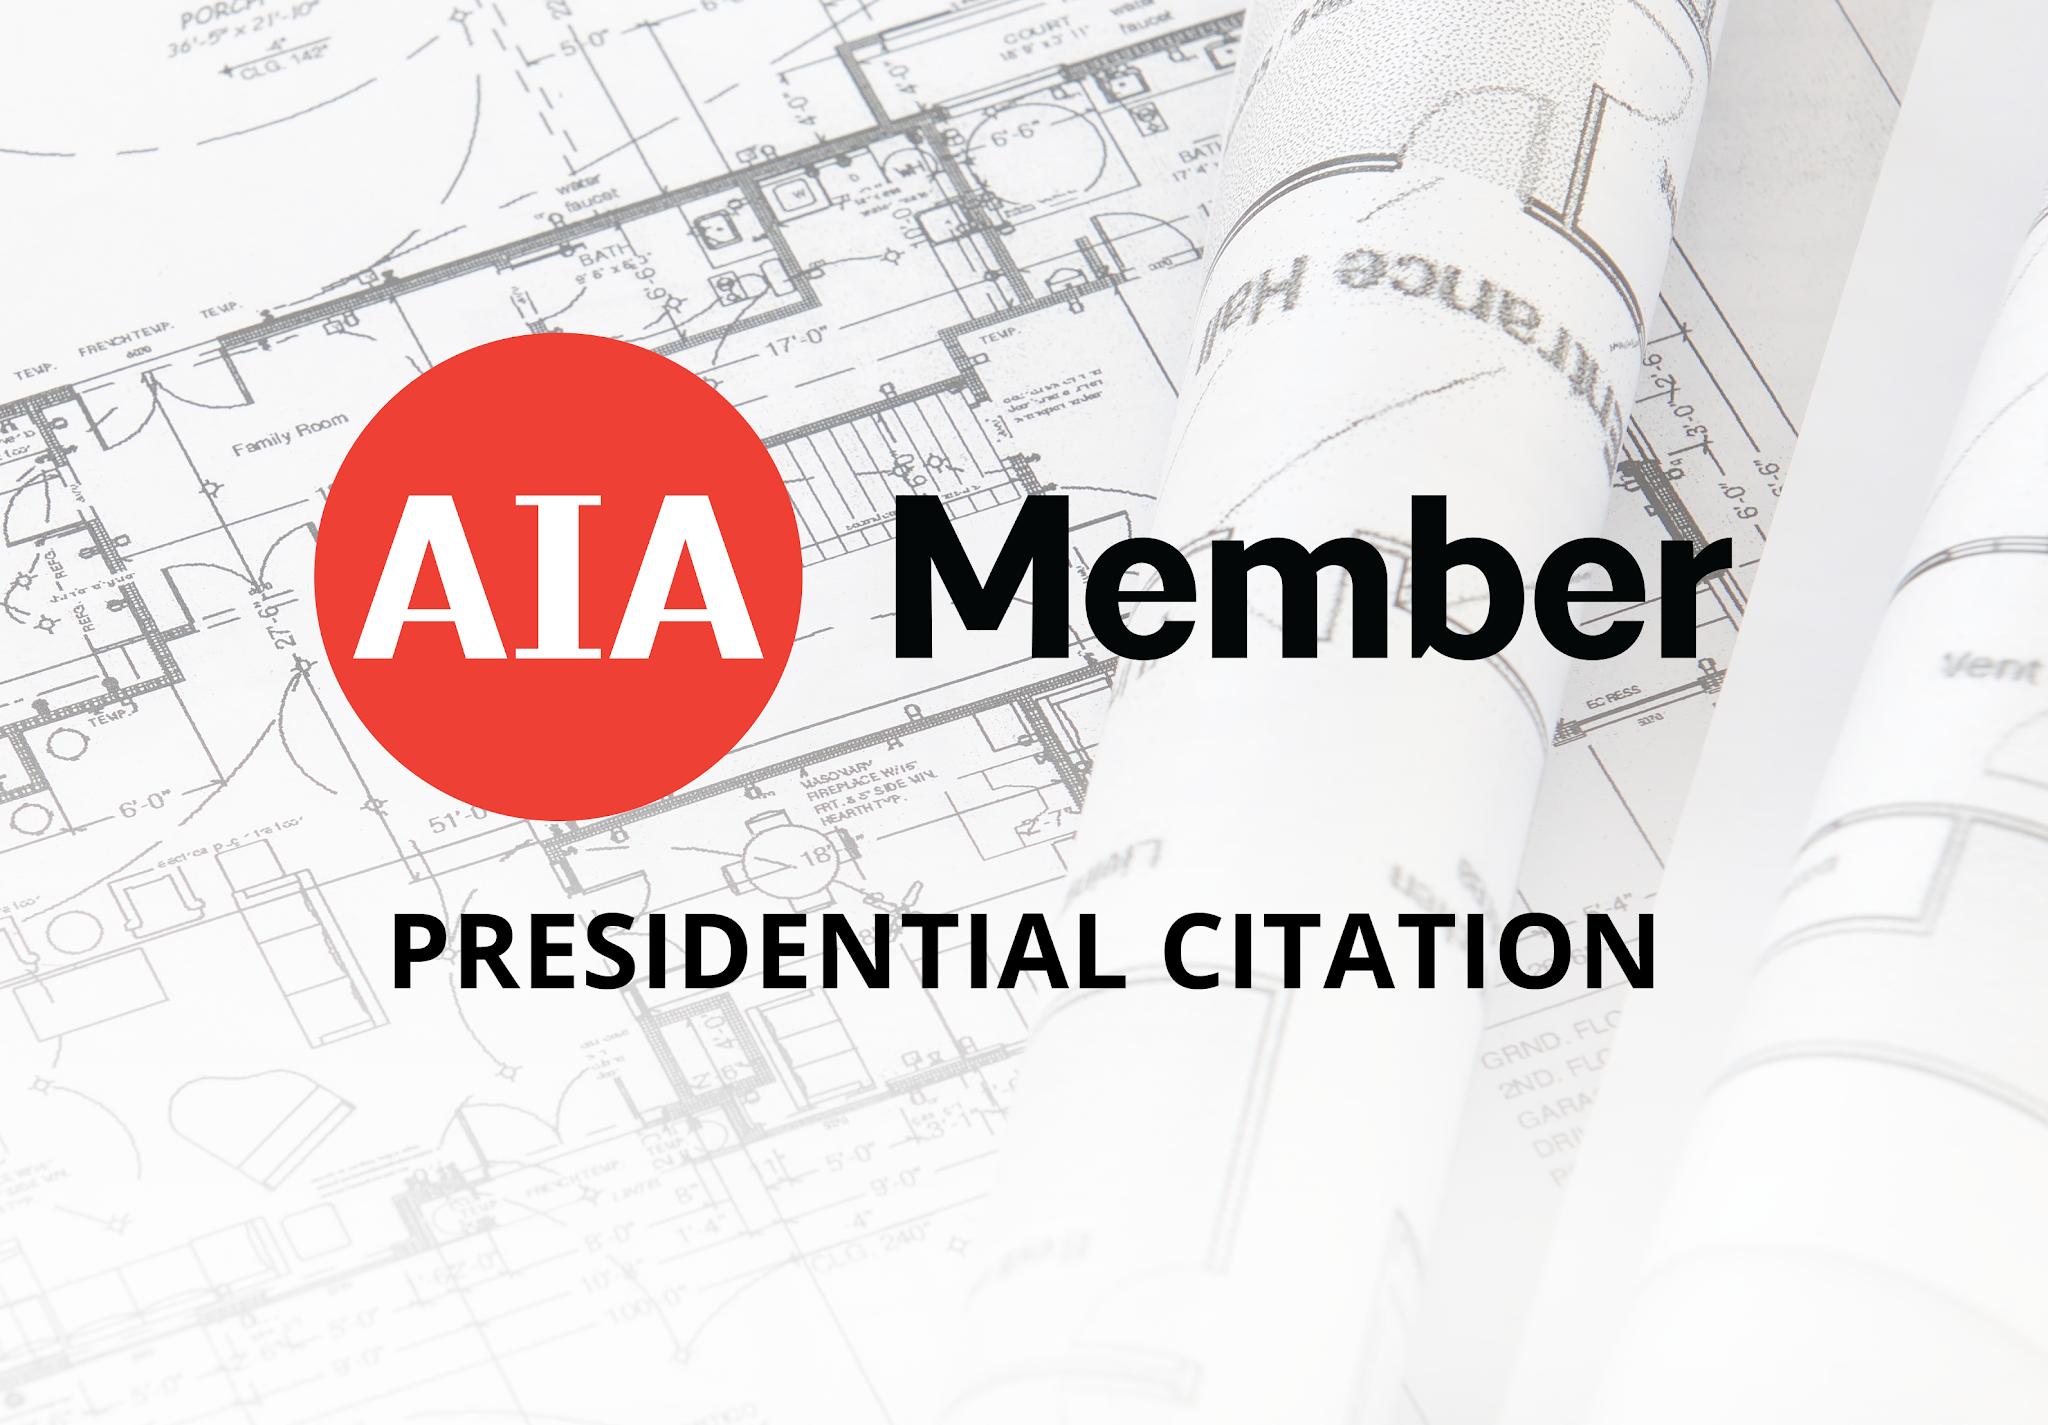 AIA Presidential Citation - Dr .Molly M. Scanlon PR